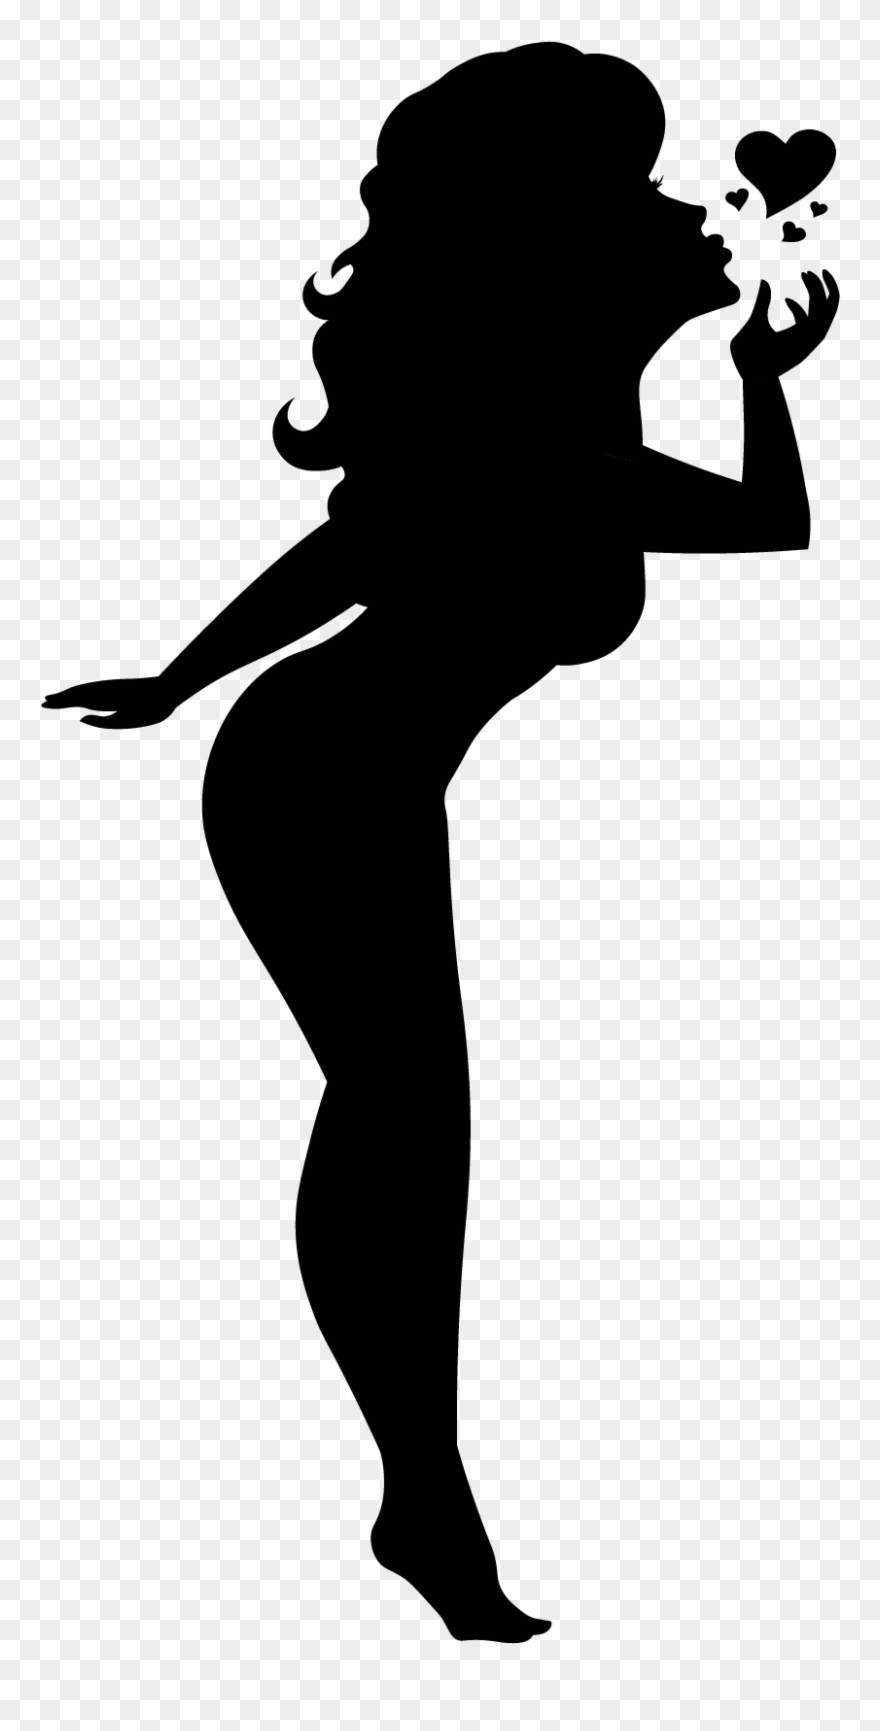 Blowing A Kiss Silhouette Pinup Girl Black Cutout Pin.